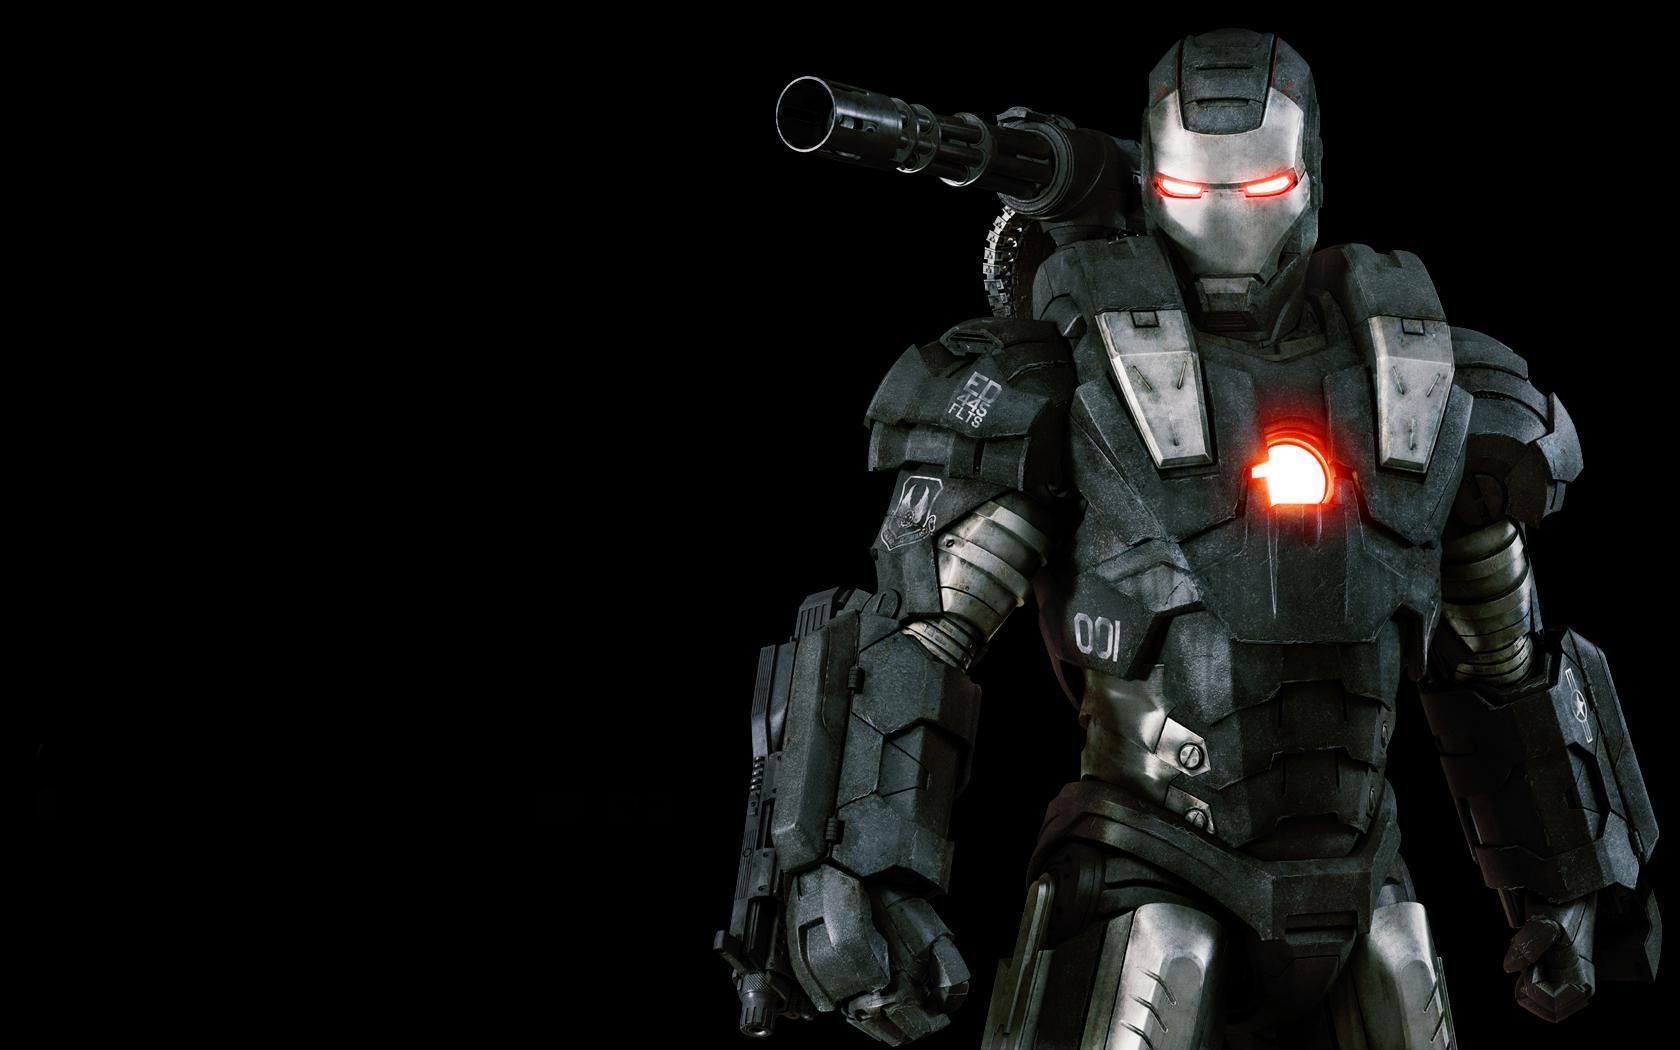 Drawn wars iron man 2 war machine Page Voting 4/10 Costume Marvel